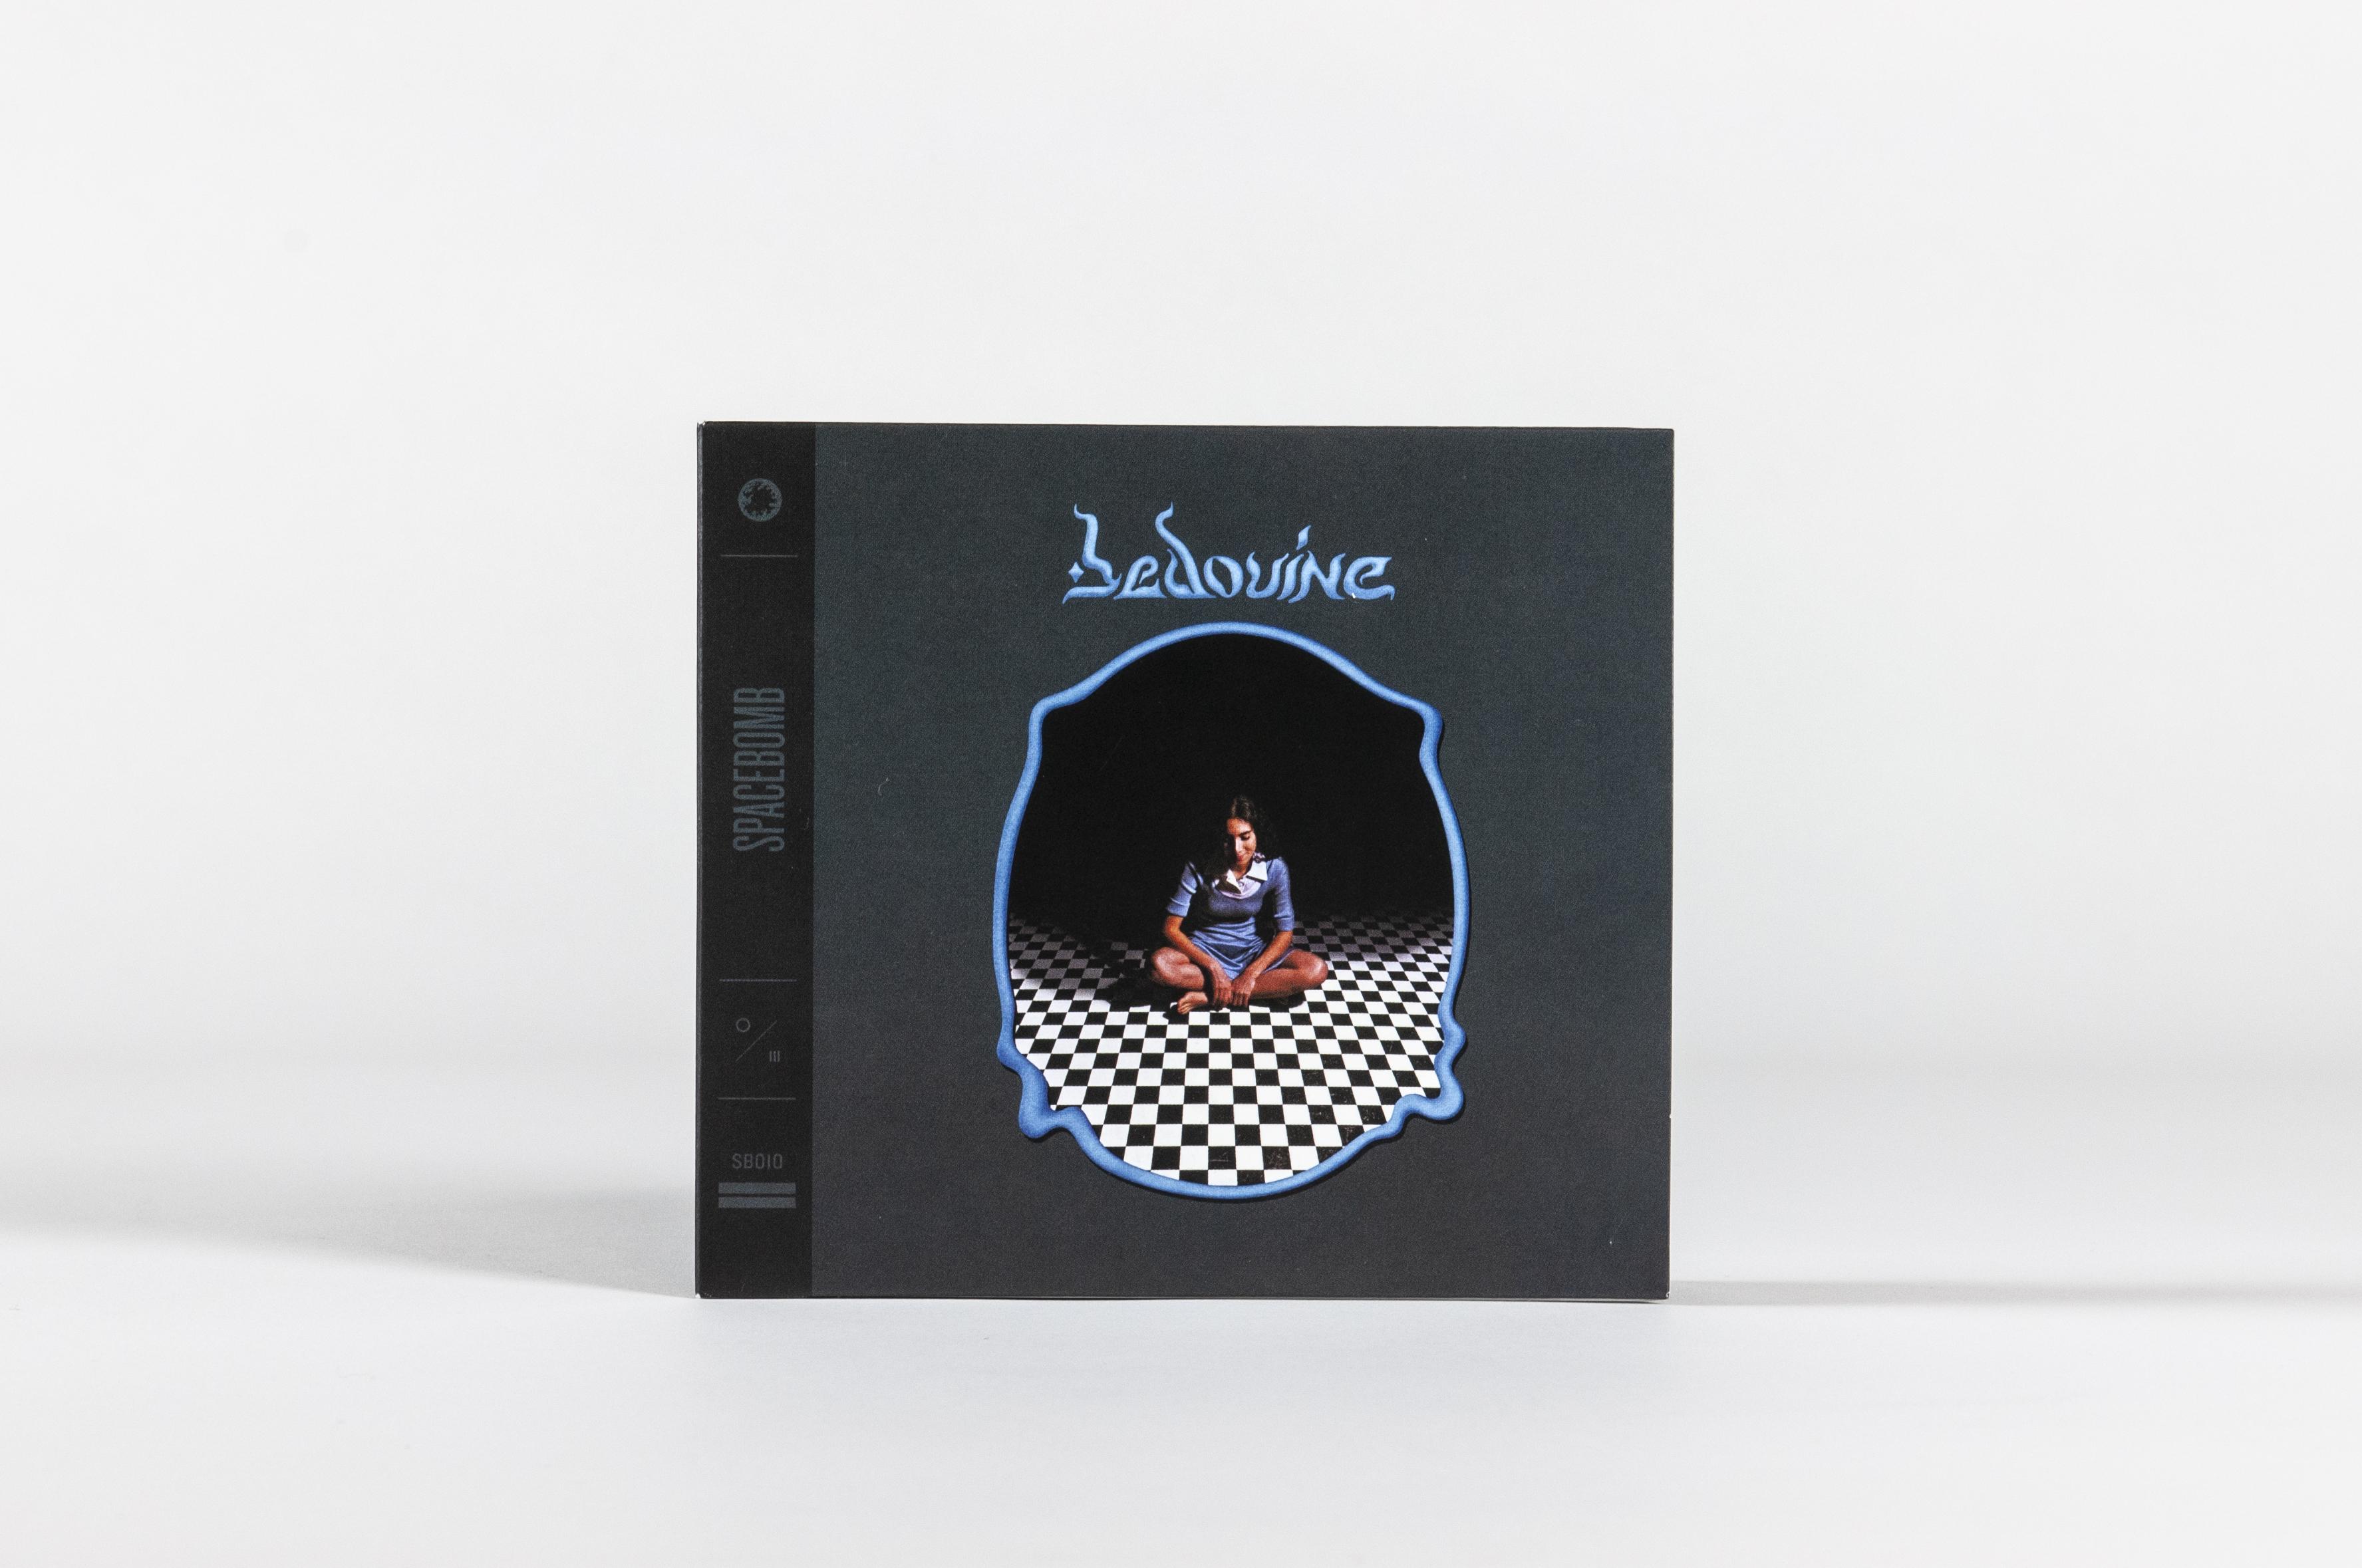 Bedouine – 'Bedouine' – CD - Spacebomb Records